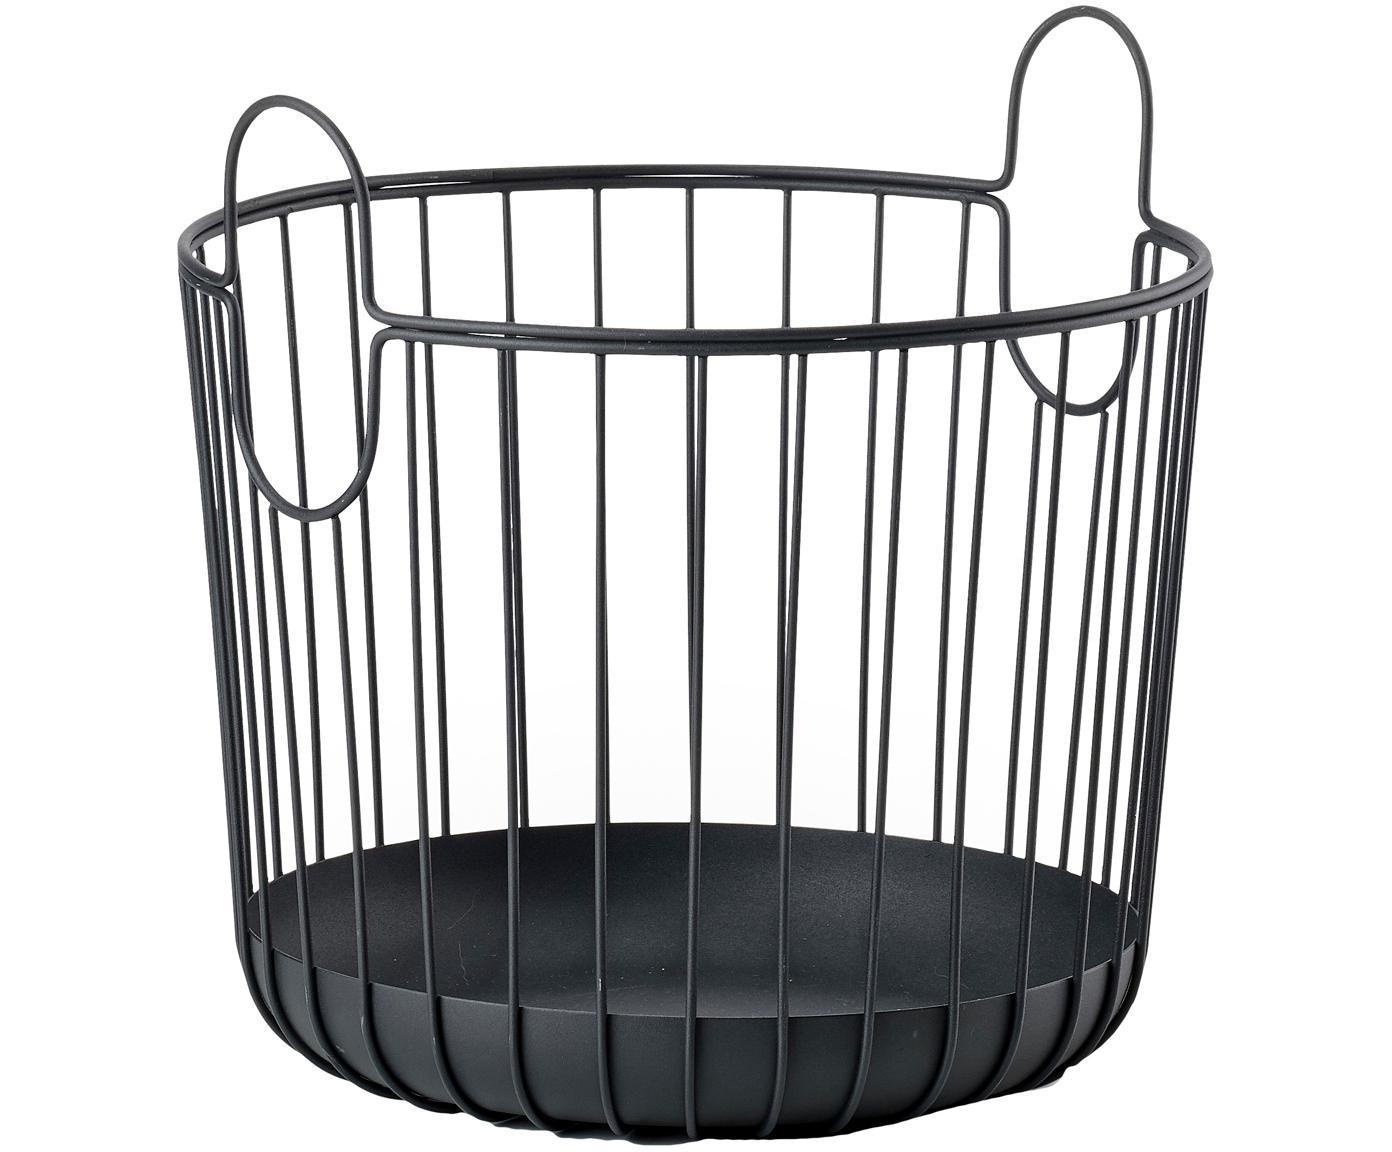 Cesta Ina, Metal, Negro, Ø 30 x Al 31 cm